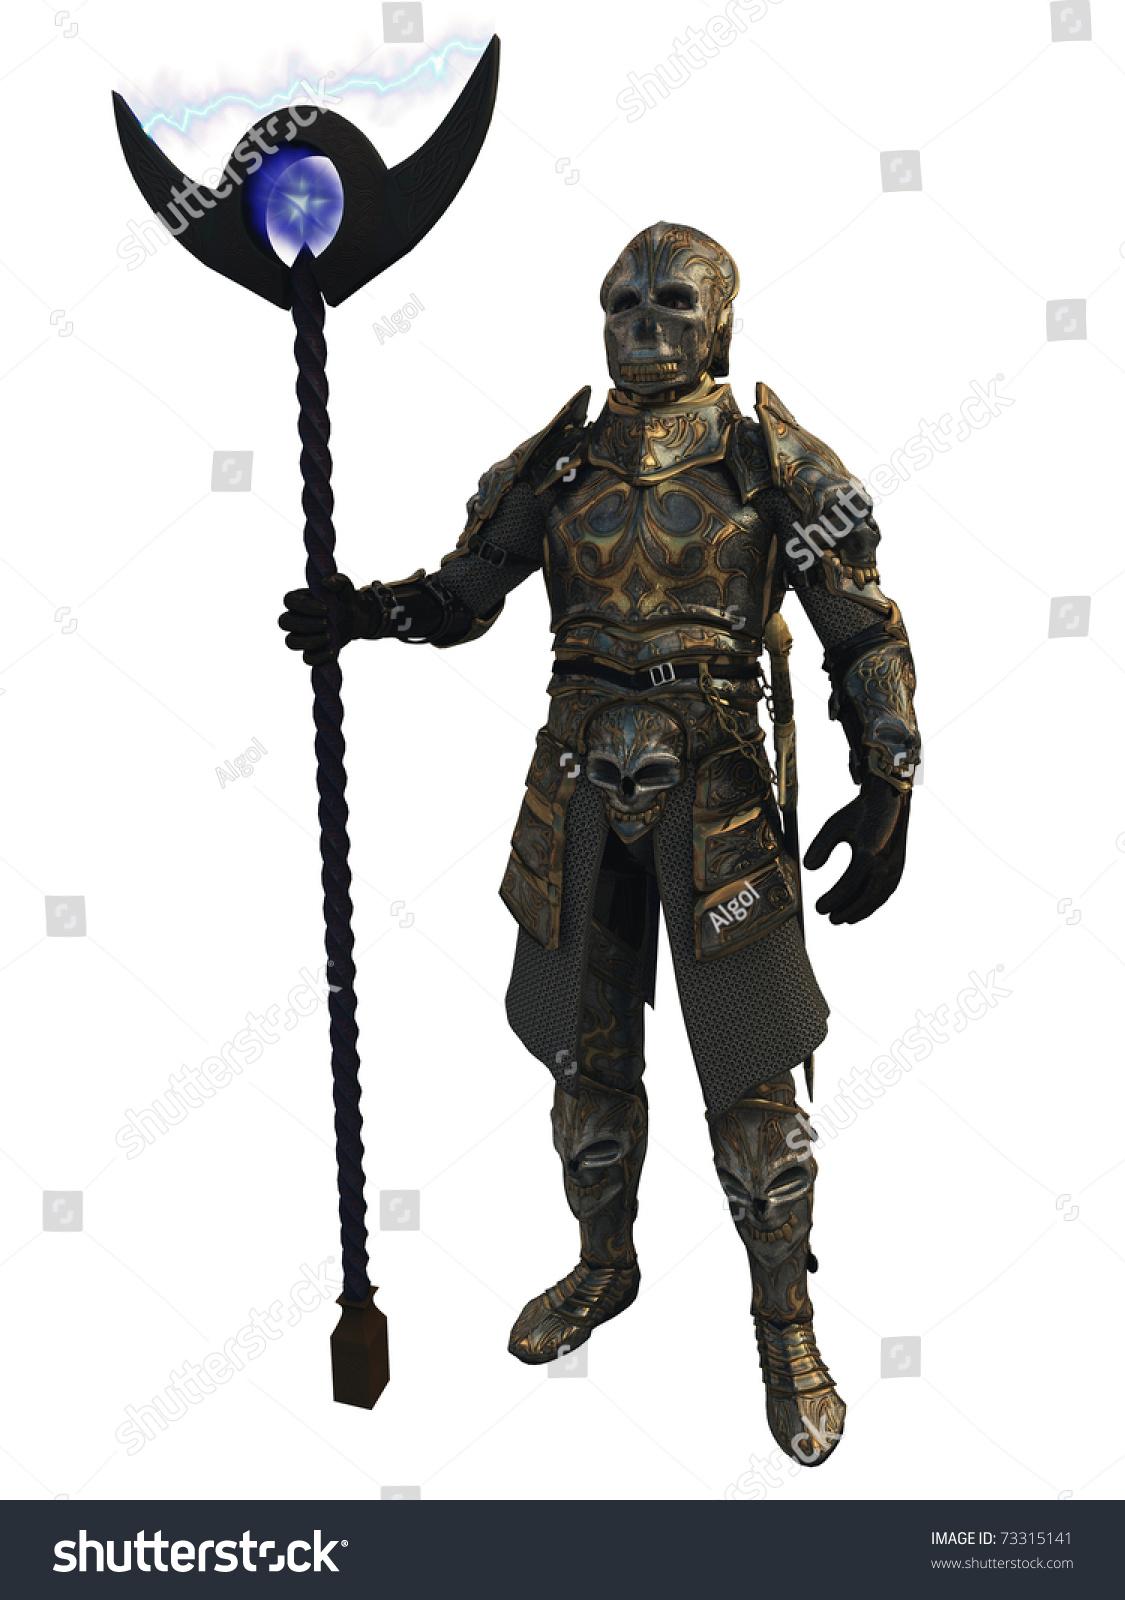 Best Motorcycle Armor >> Evil Knight Helmet | www.imgkid.com - The Image Kid Has It!